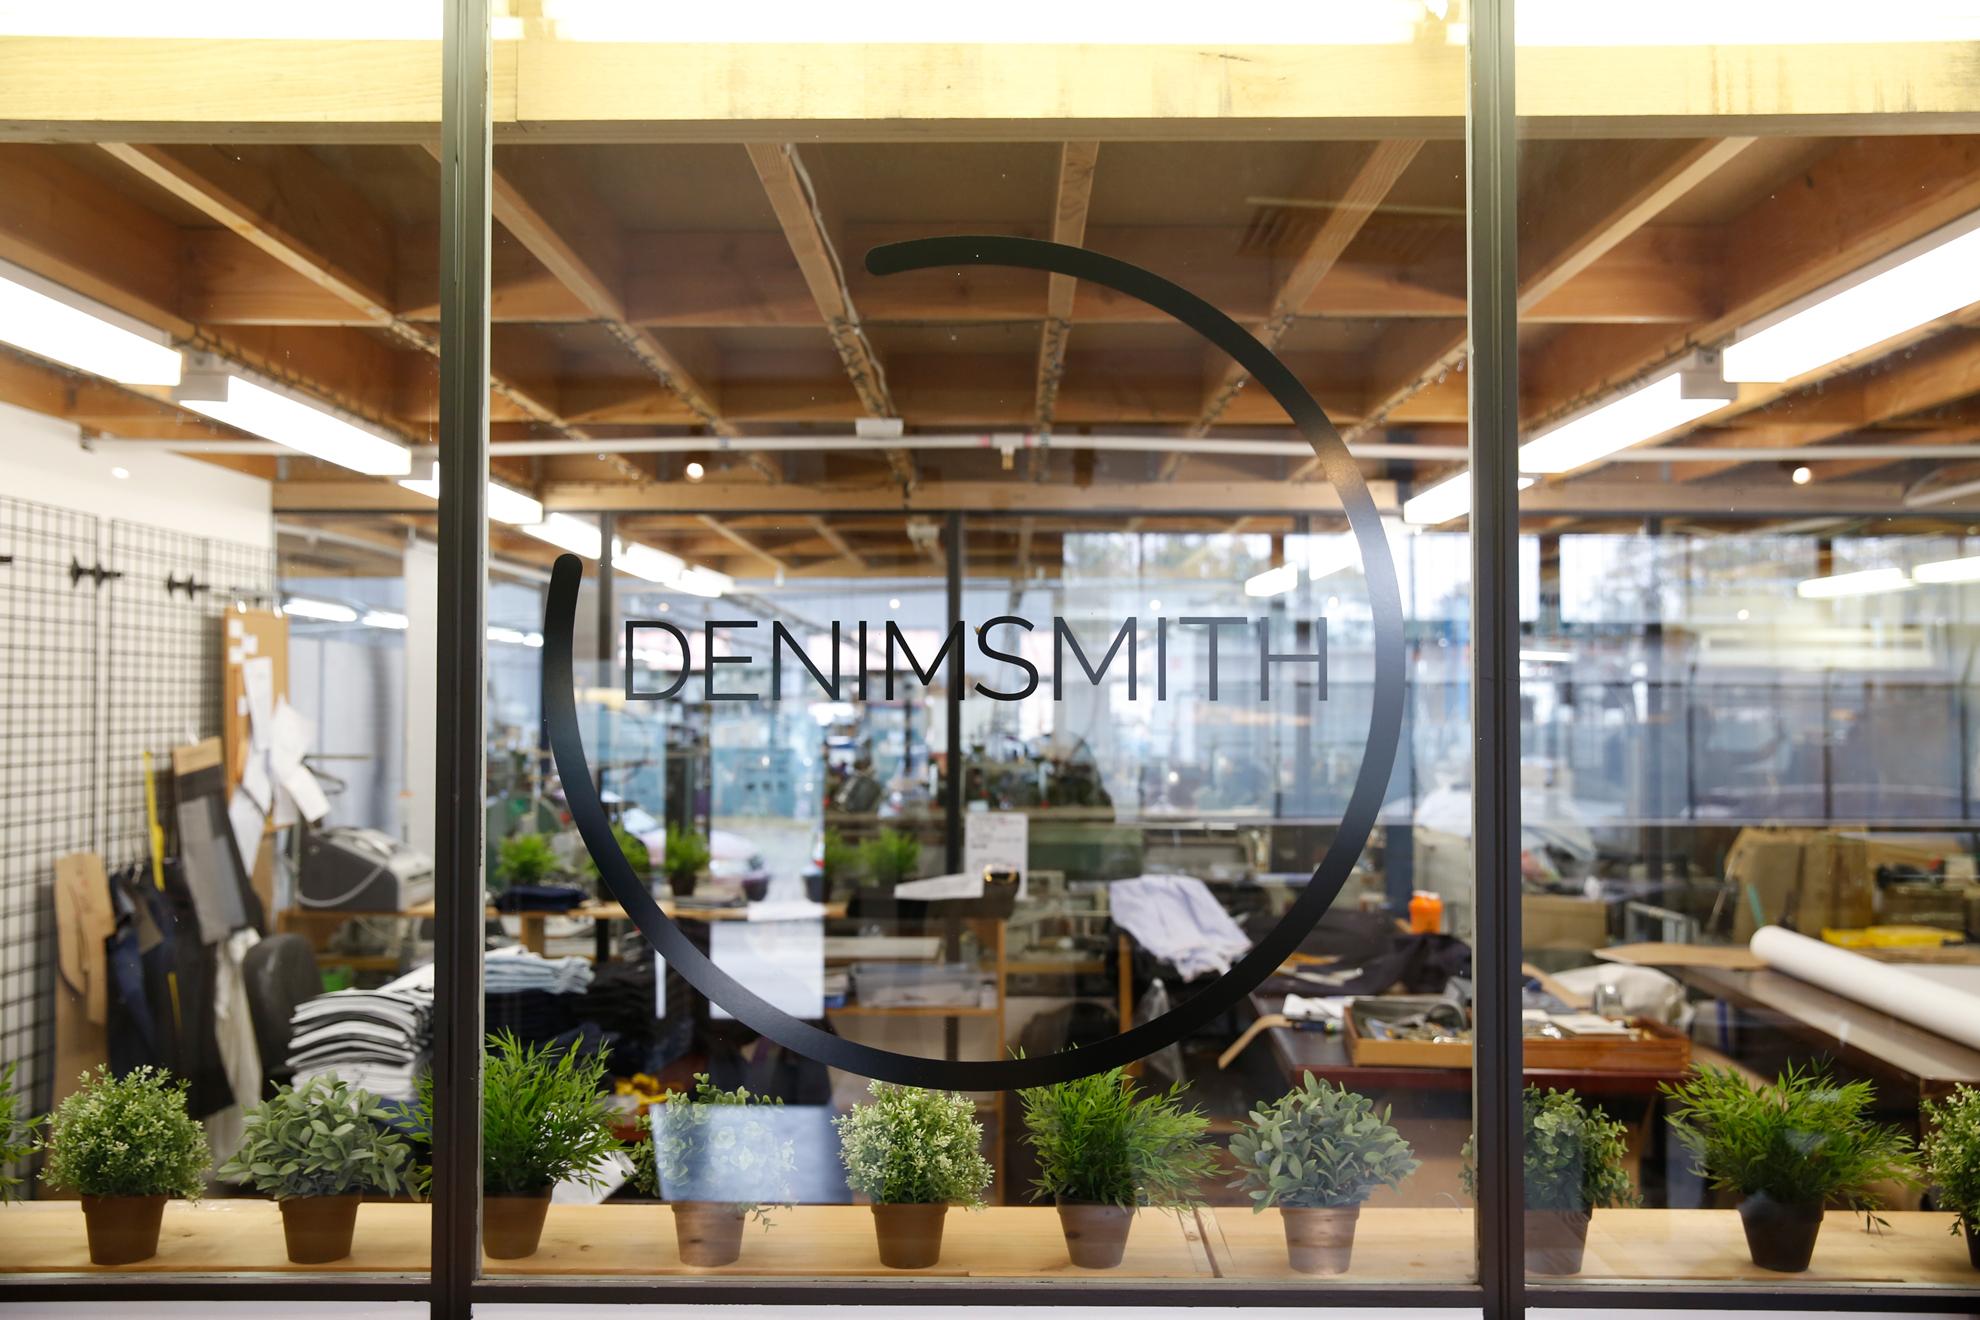 denimsmith-shop-window.jpg